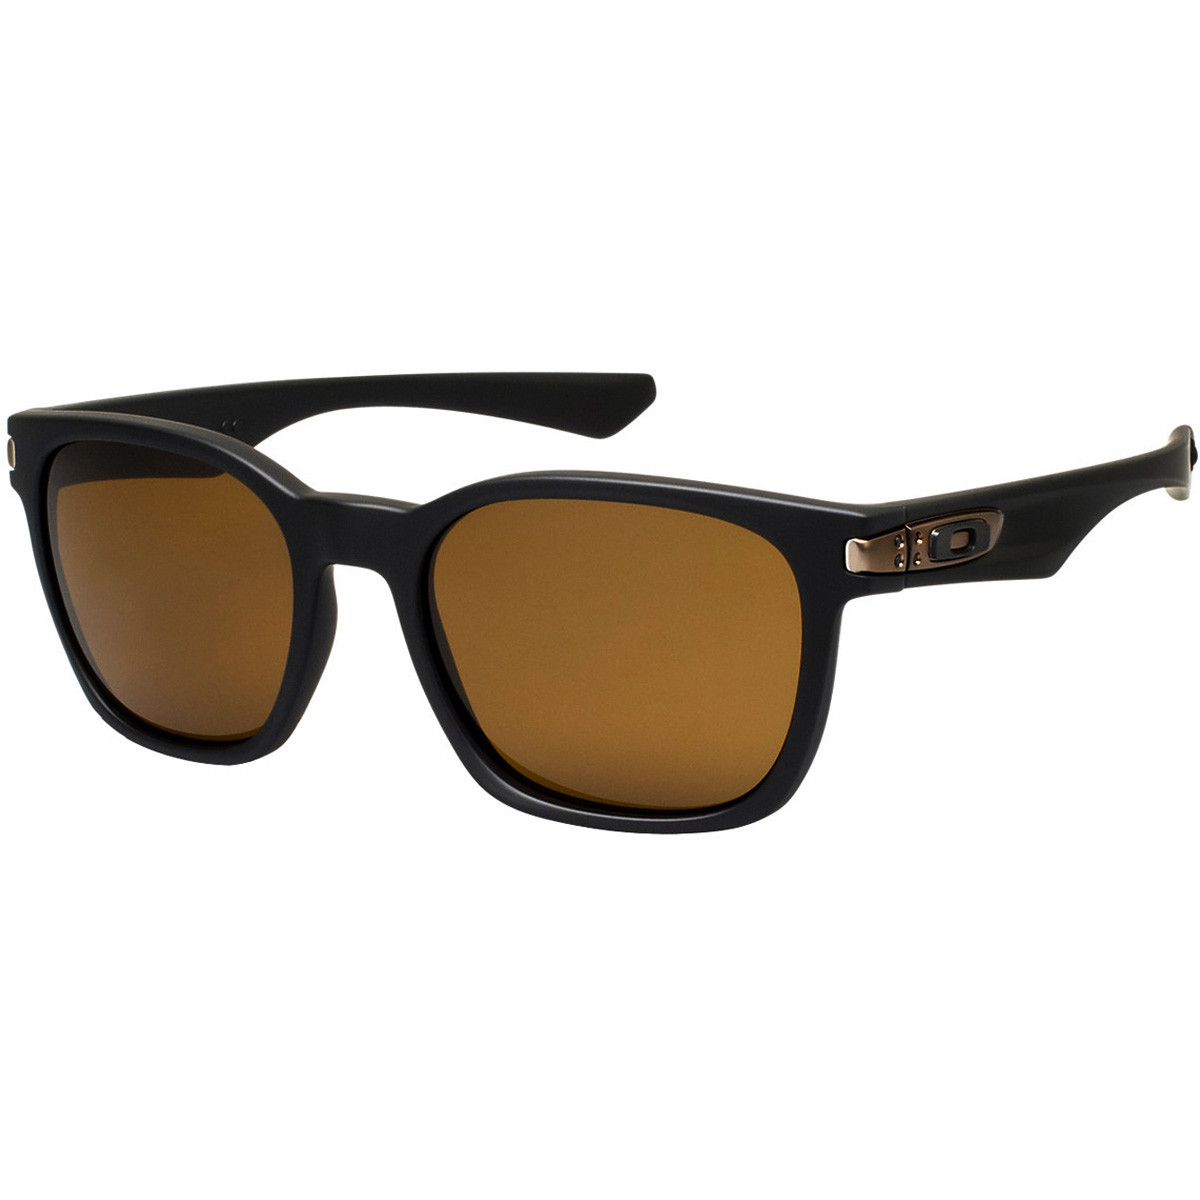 Óculos Oakley Garage Rock Matte Black  Dark Bronze LANÇAMENTO ref ... dbabb06e9e